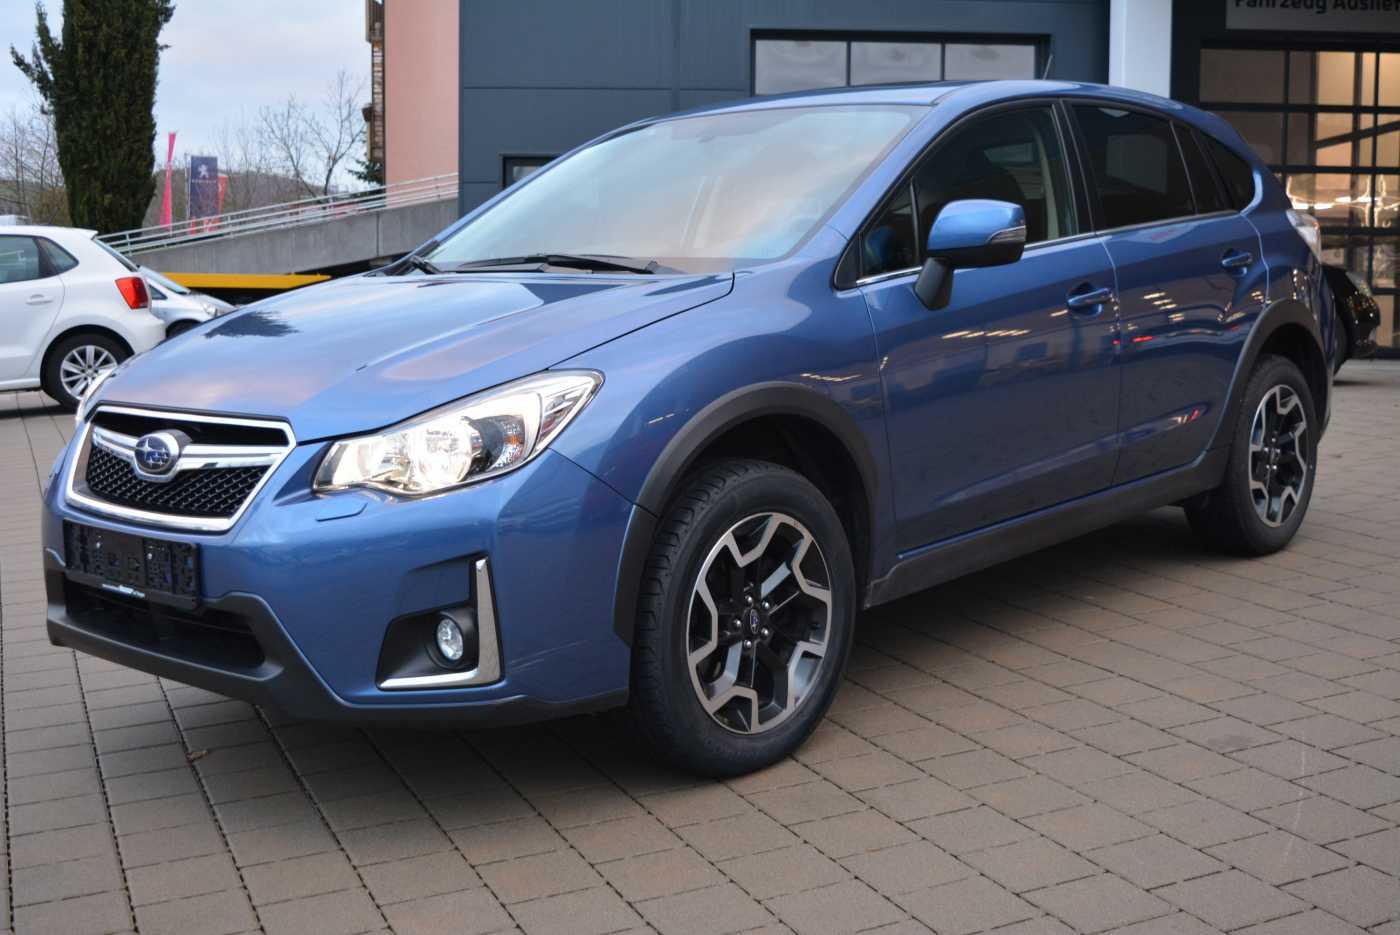 Subaru XV 2.0D 4WD Exclusive Navi,Xenon,eSD,BT,Kamera, Jahr 2016, diesel